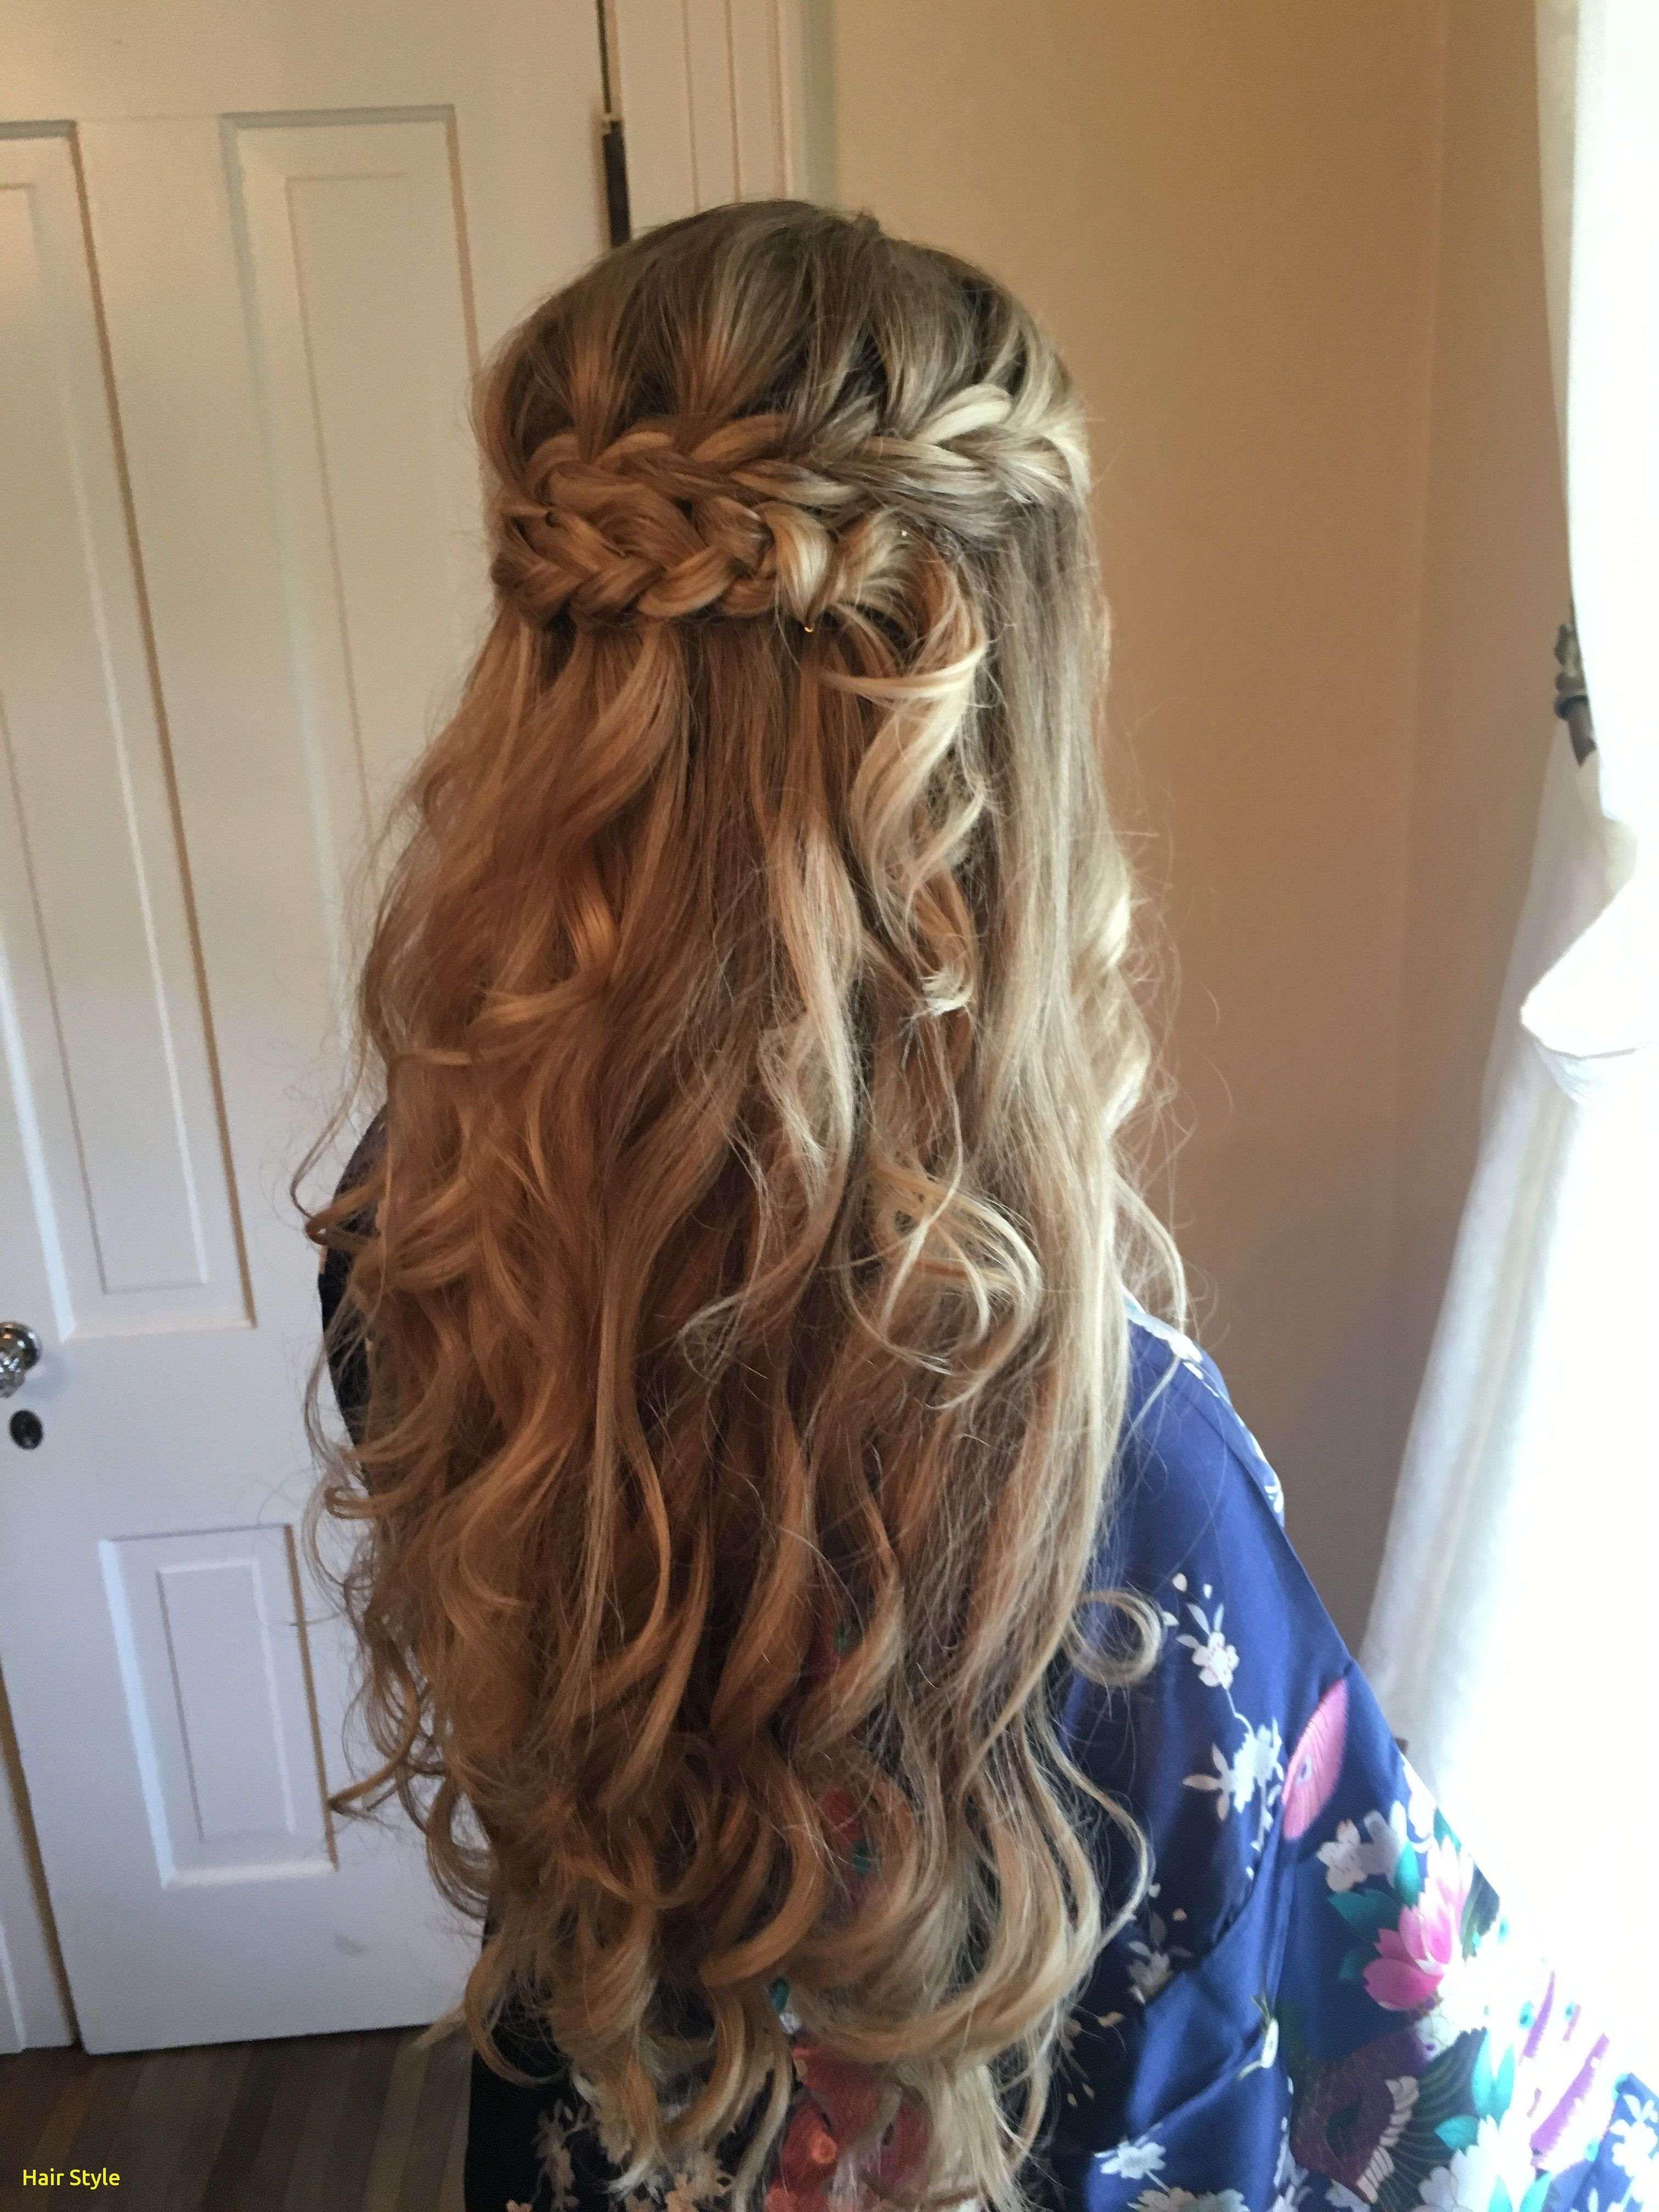 Neufrisurenstile Com Schone Frisuren Lange Haare Frisuren Lange Haare Hochzeitsgast Lockige Hochzeitsfrisuren